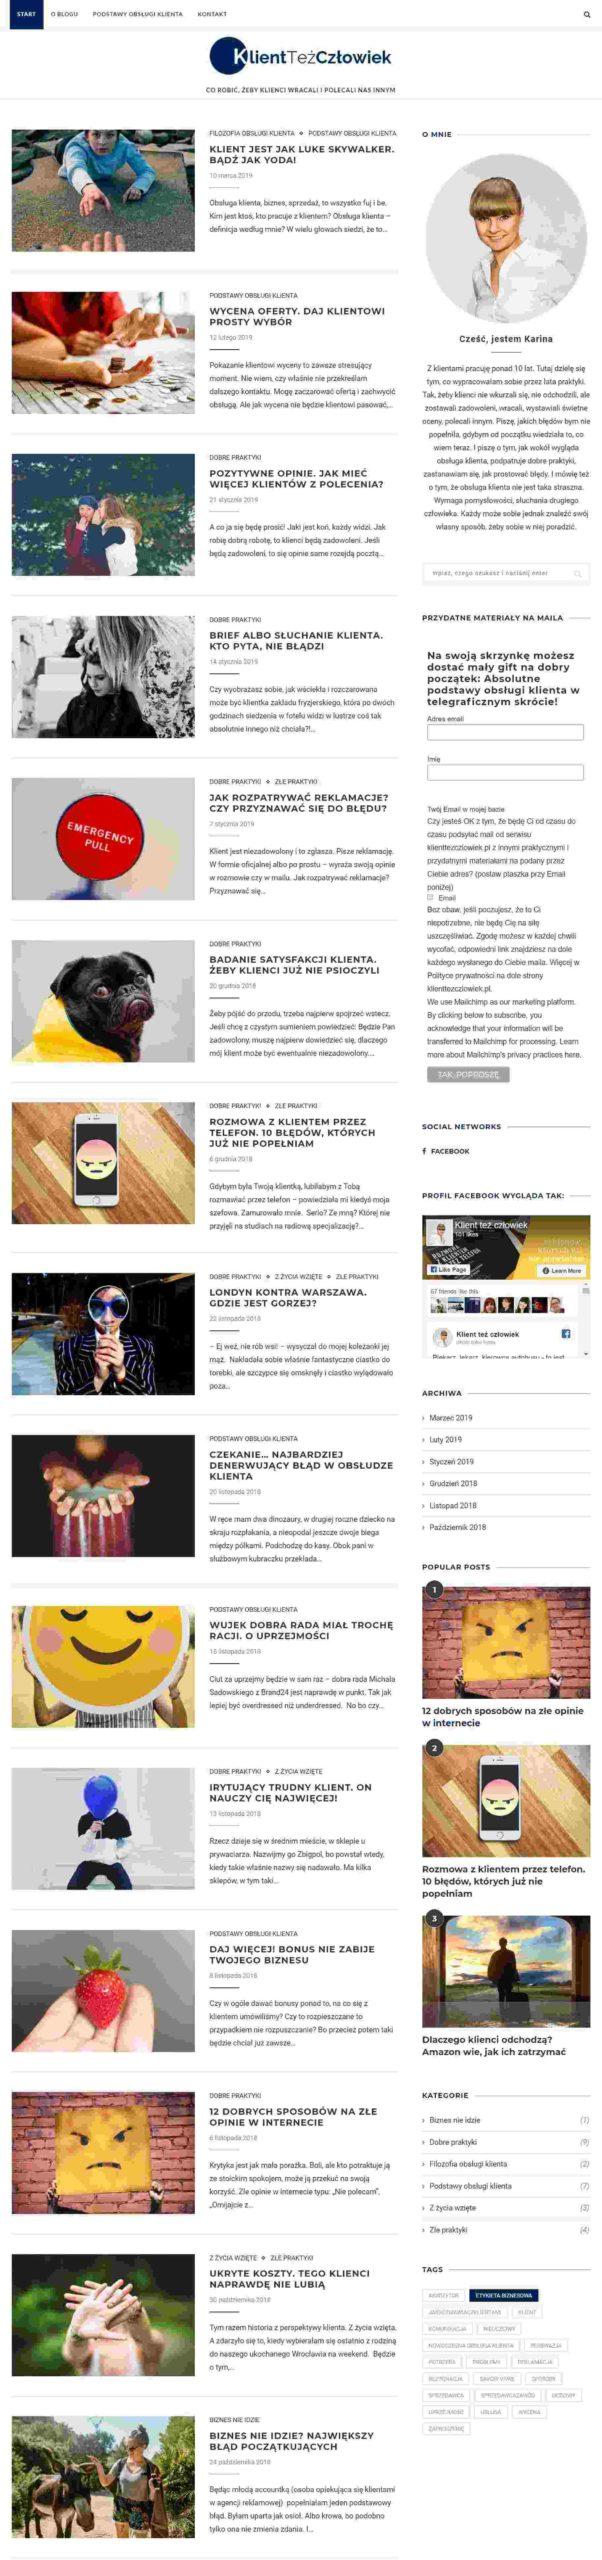 content marketing system newsletterowy freebee przyklad moovi